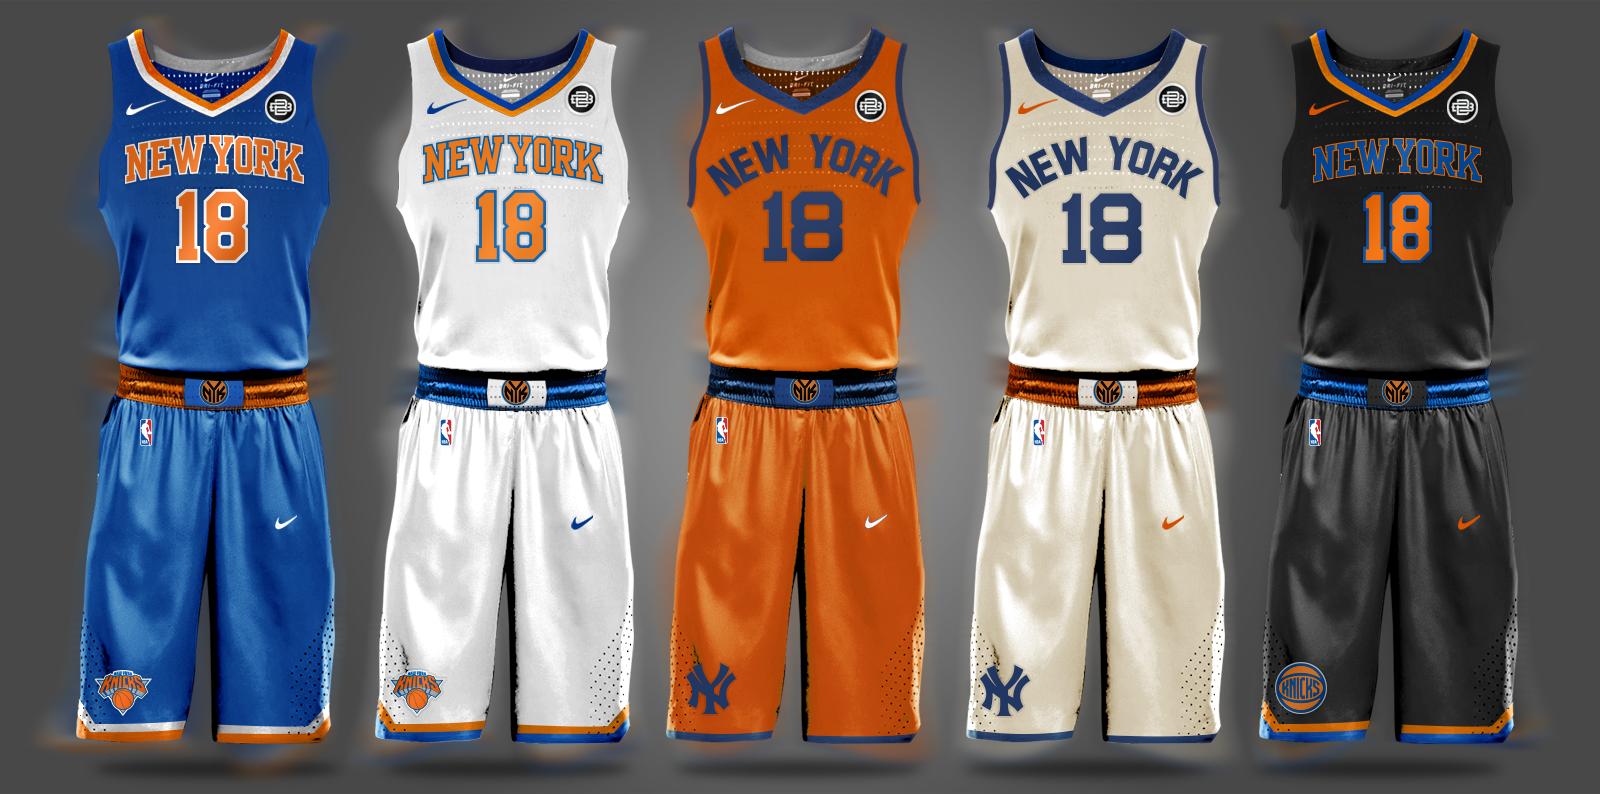 9bc512573 New York Knicks Carmelo Anthony Kristaps Porzingis Phil Jackson NBA Draft  Nike Throwback Uniforms Tim Hardaway Jr